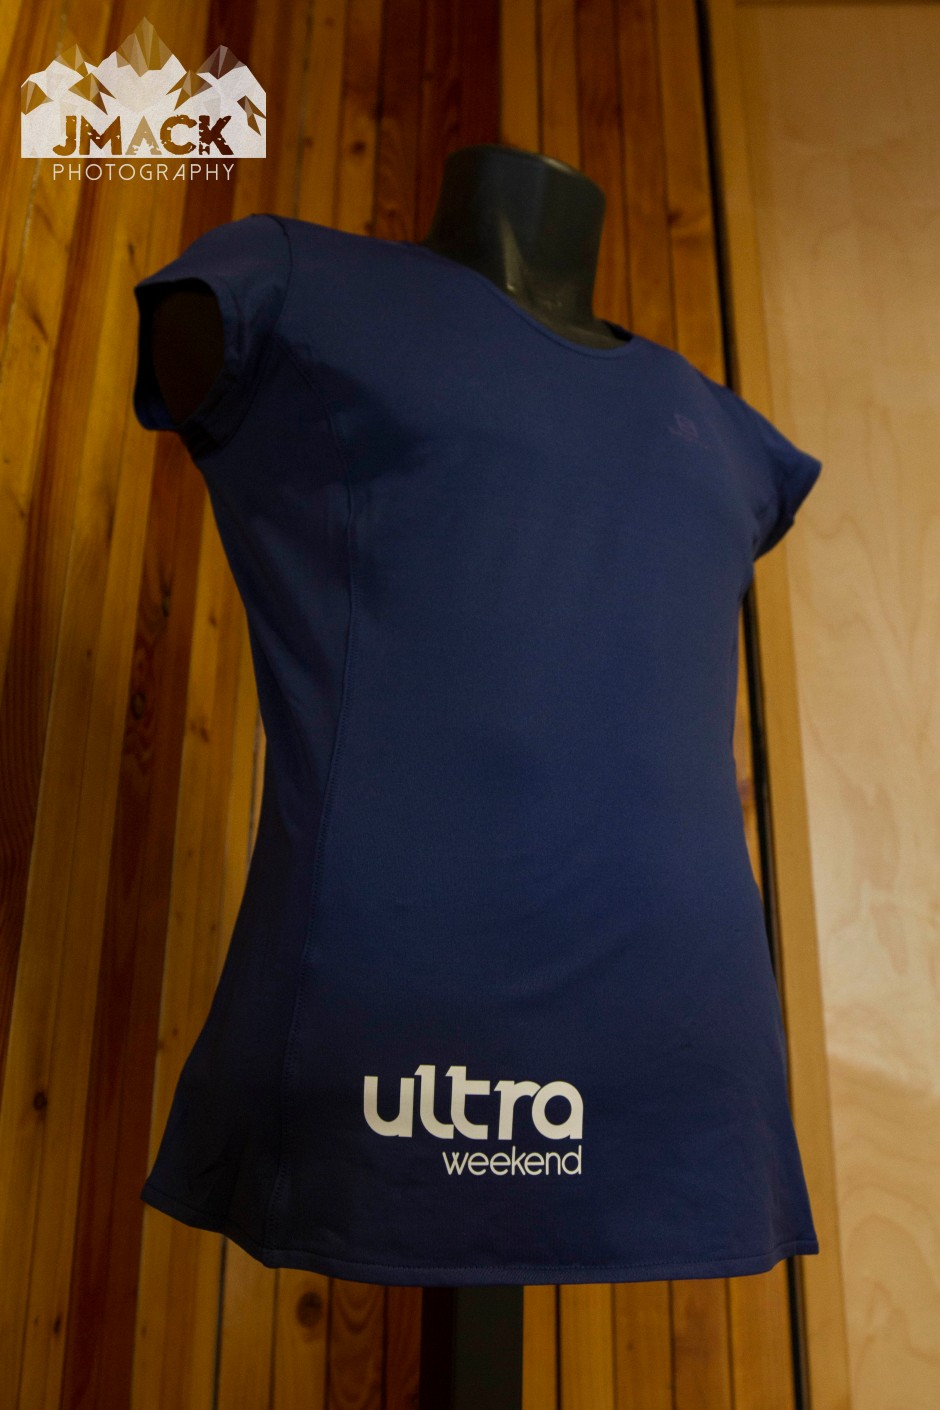 Run Coed Y Brenin Ultra Weekend T-shirt